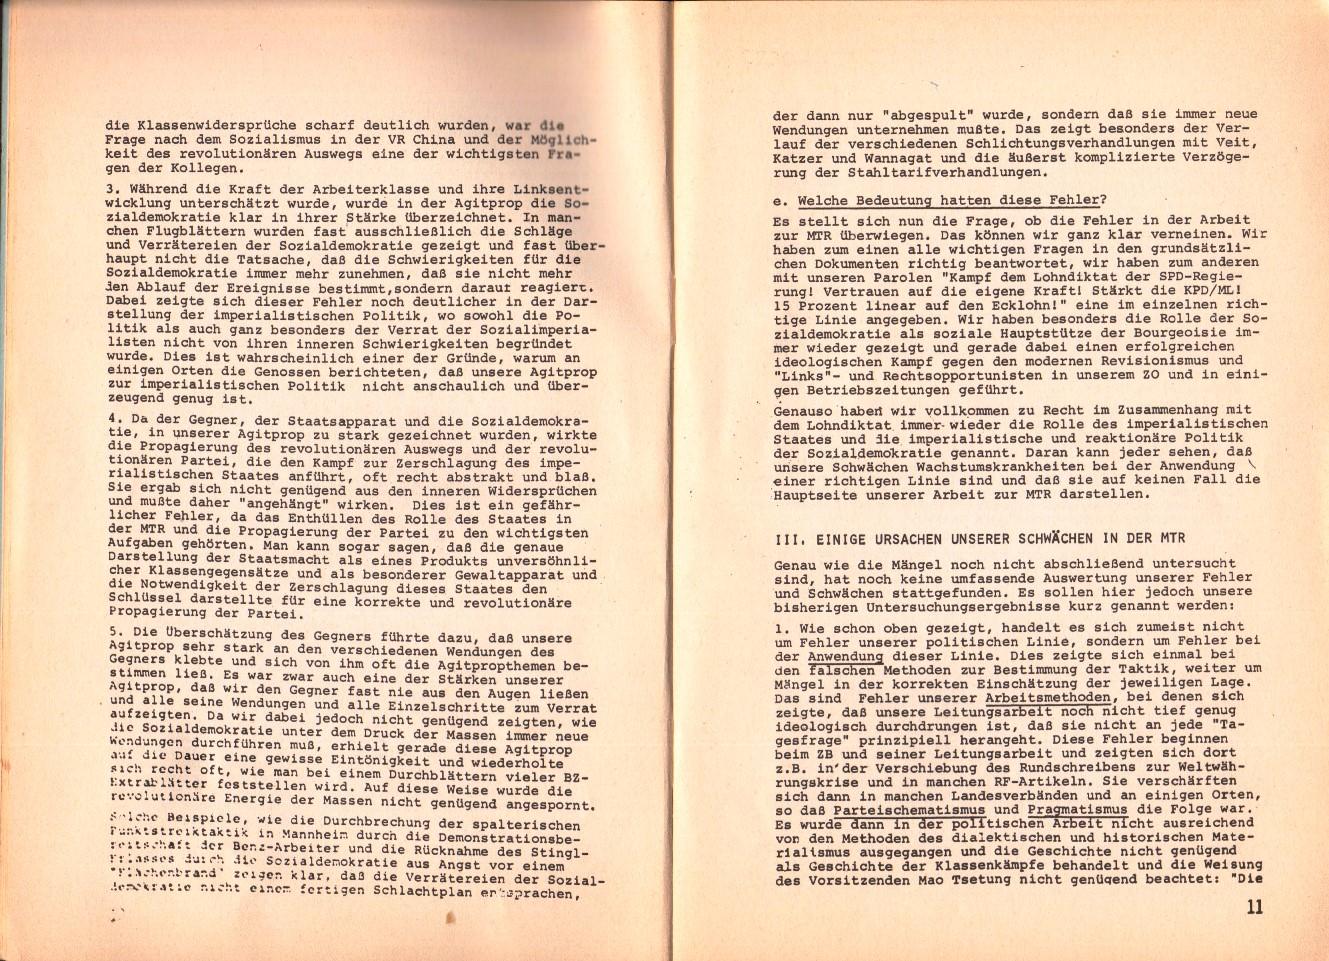 ZB_Parteiarbeiter_1971_10_07